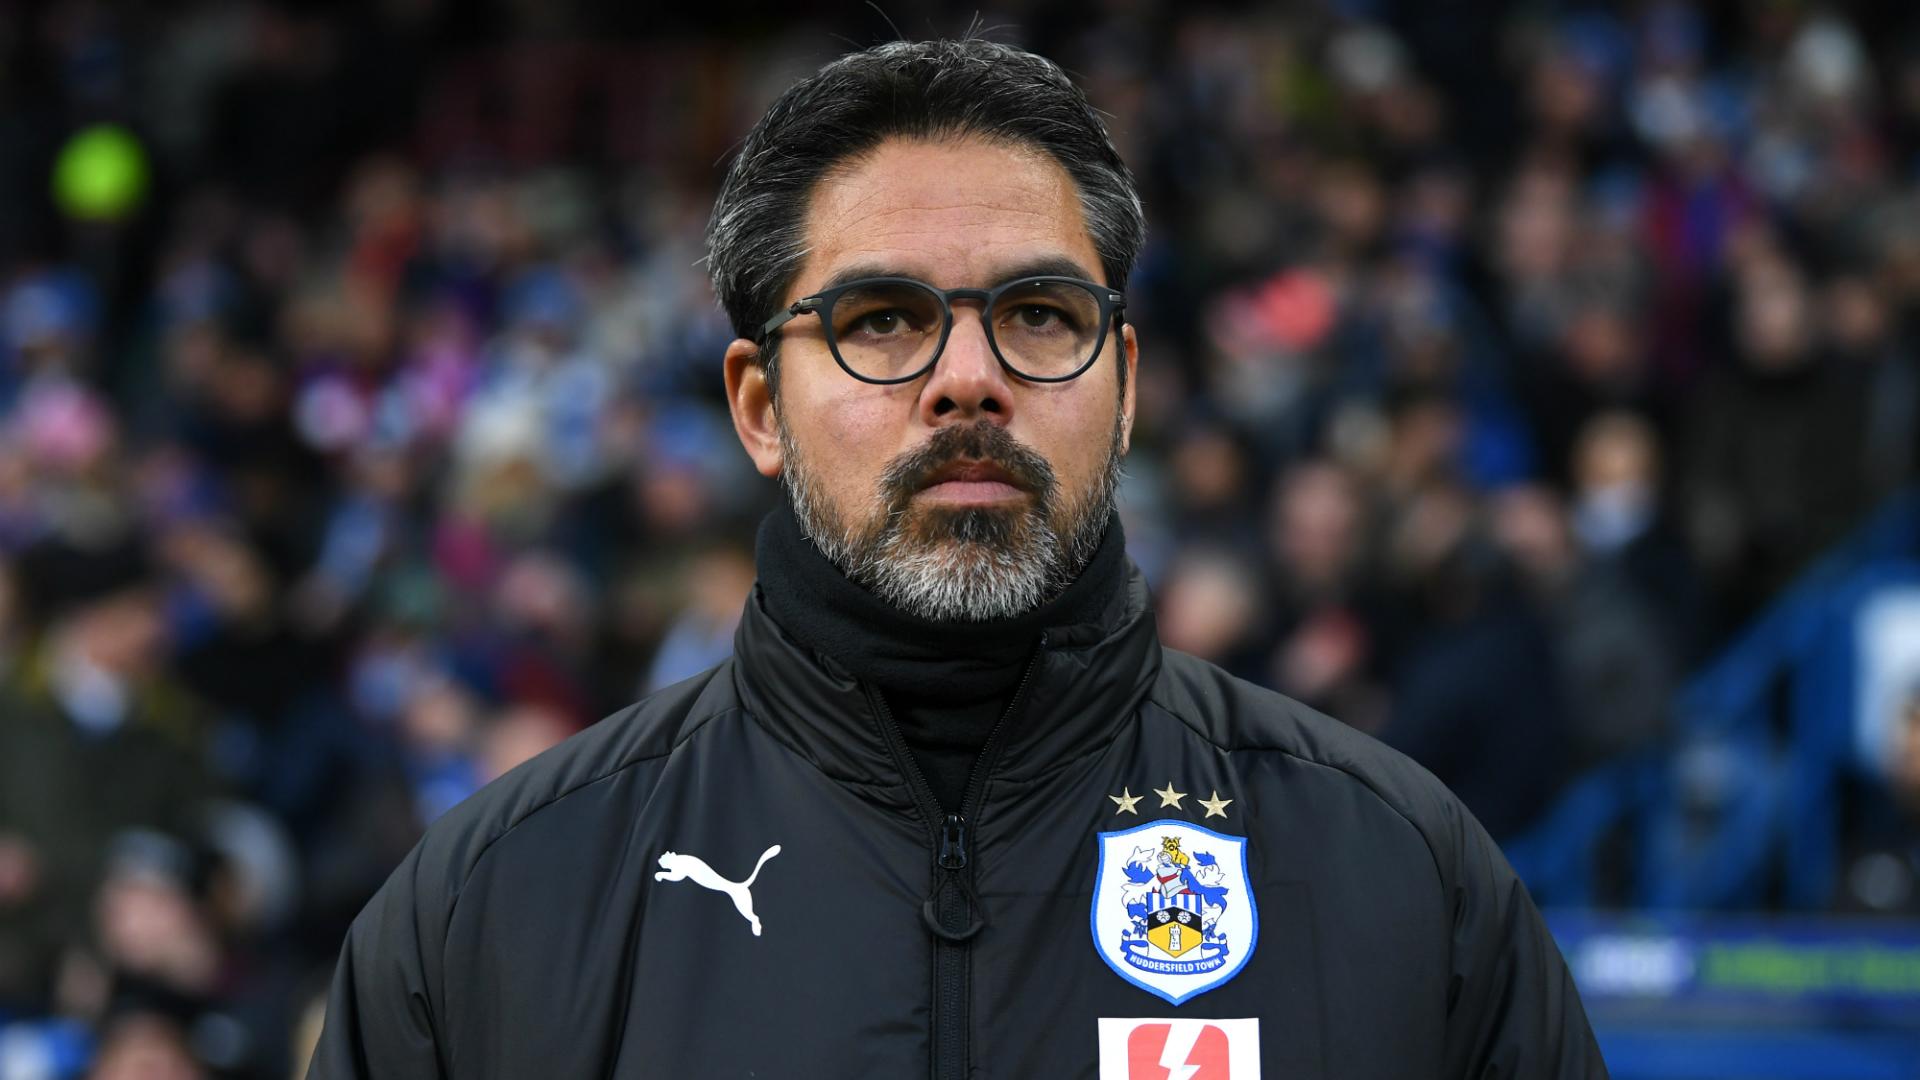 Premier League: Huddersfield cancels flight to return home on party bus